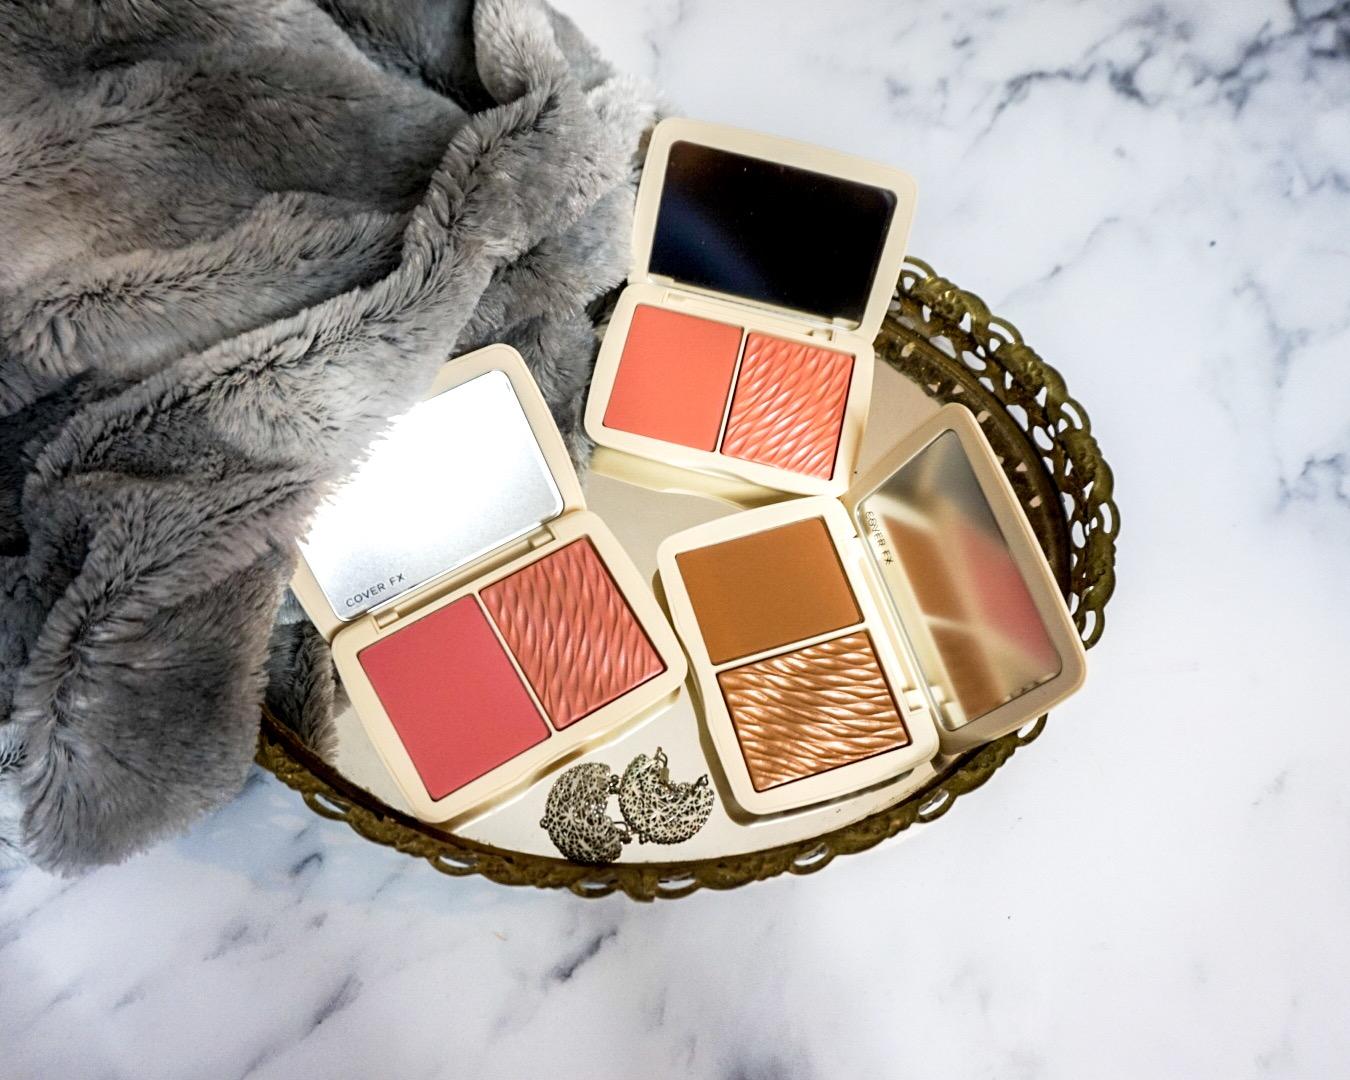 Sephora VIB Sale Haul - April 2019 - Cover FX Monochromatic Blush & Bronzer Duos